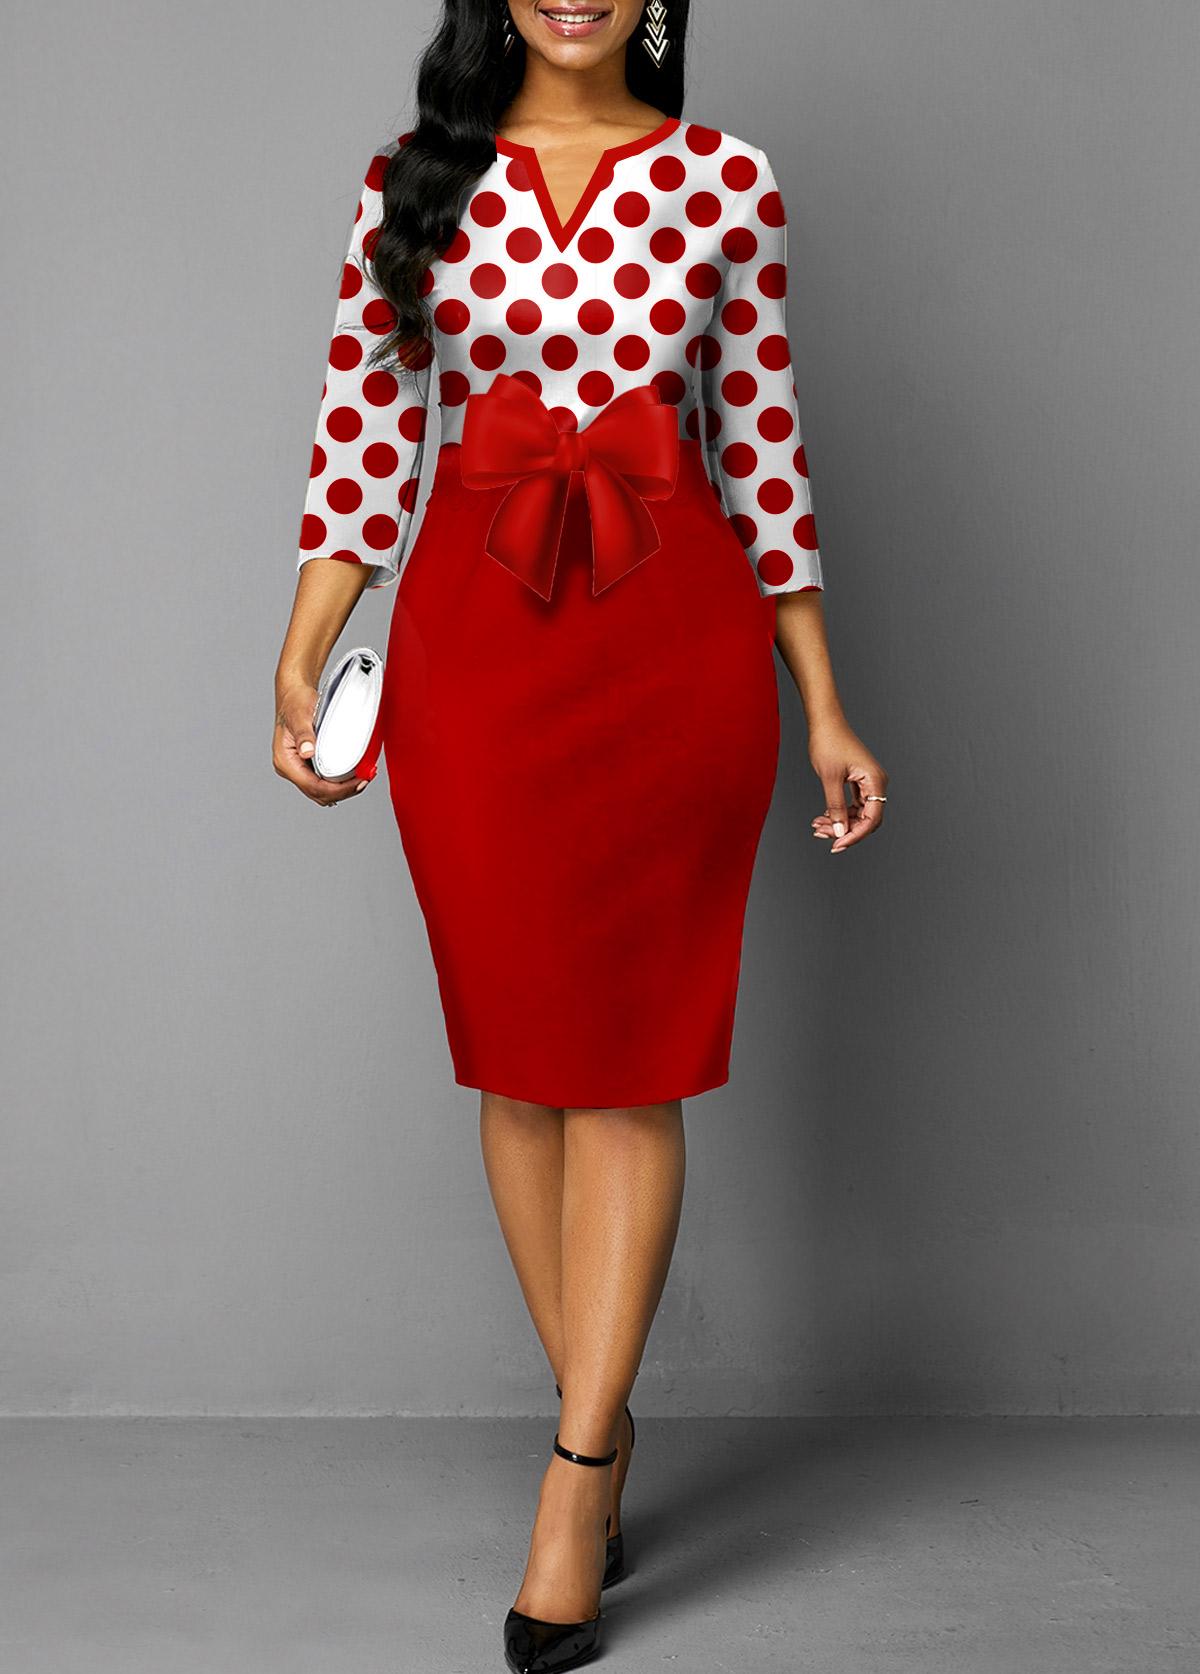 Bowknot Red Polka Dot Split Neck Dress